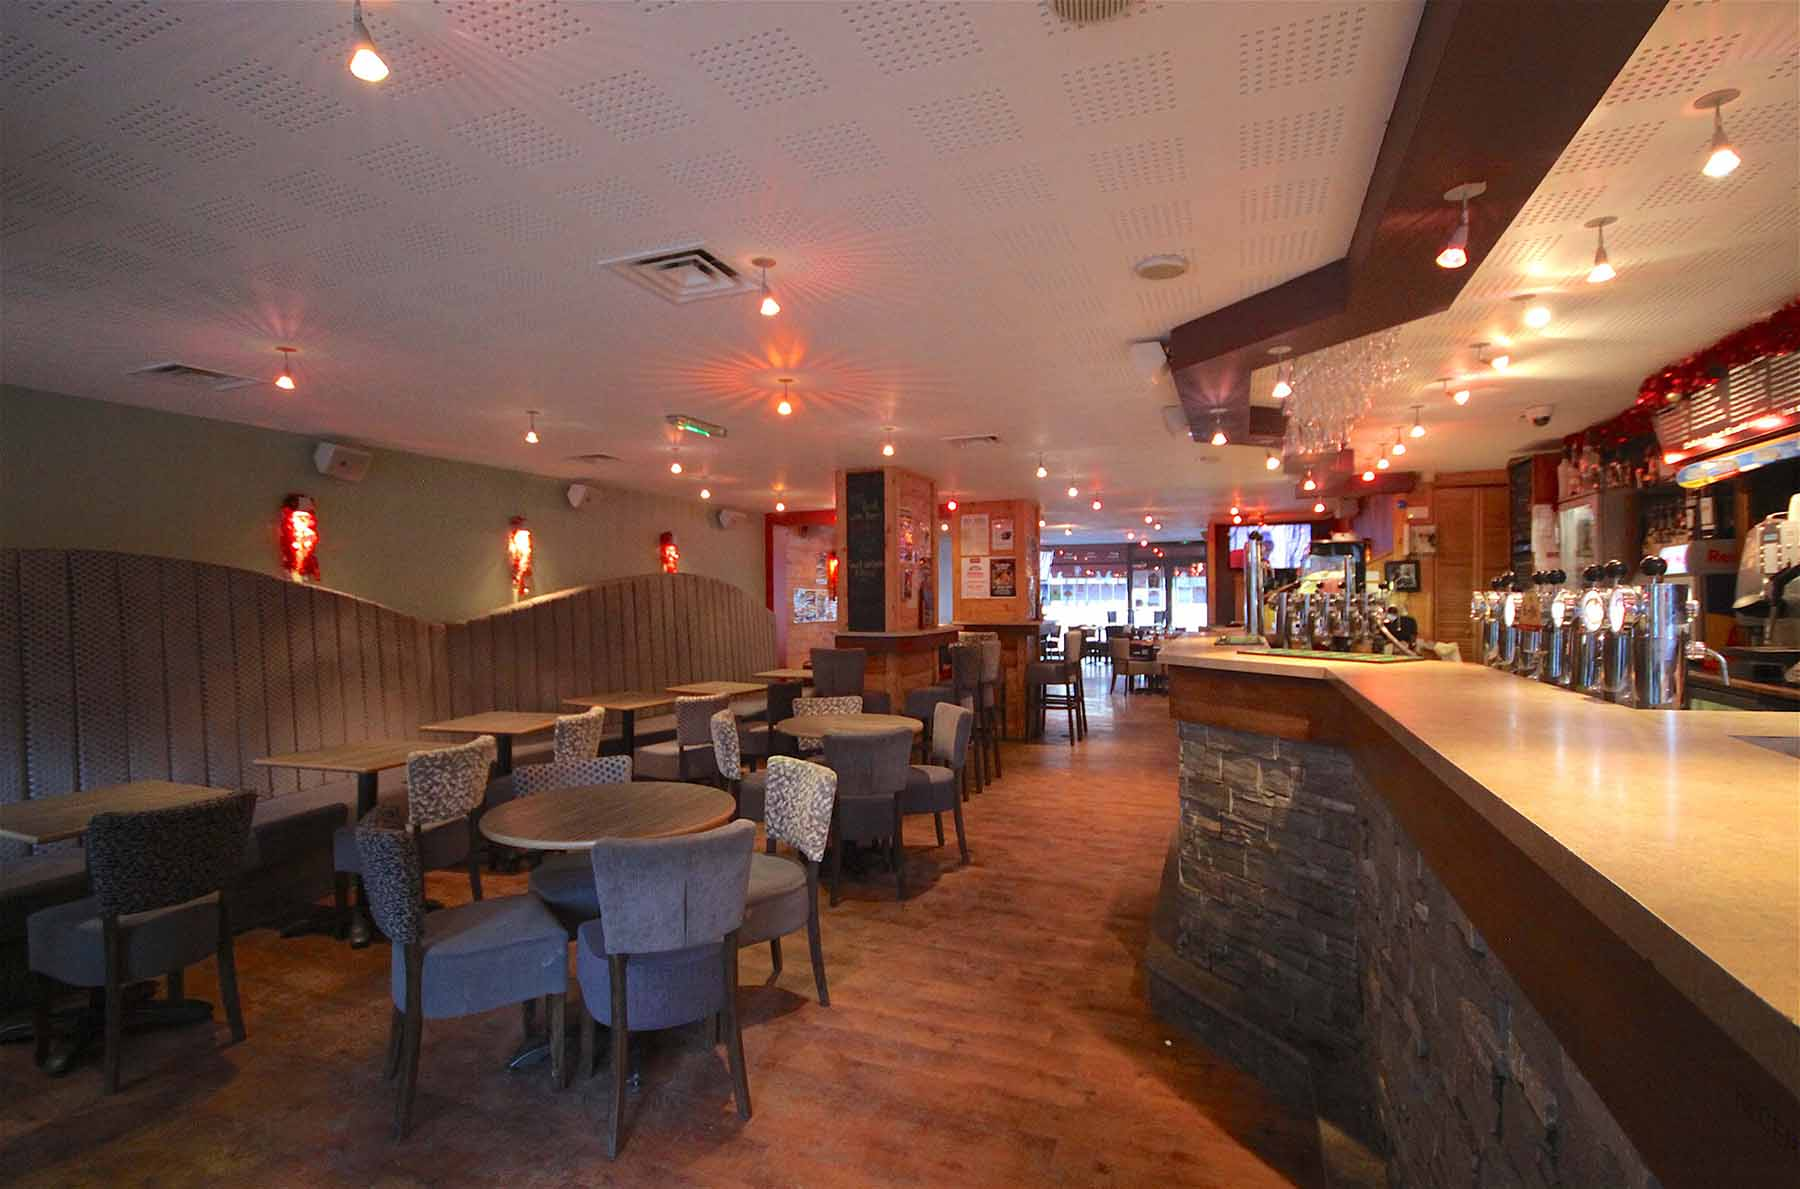 Rhodos Hotel Bar & Restaurant